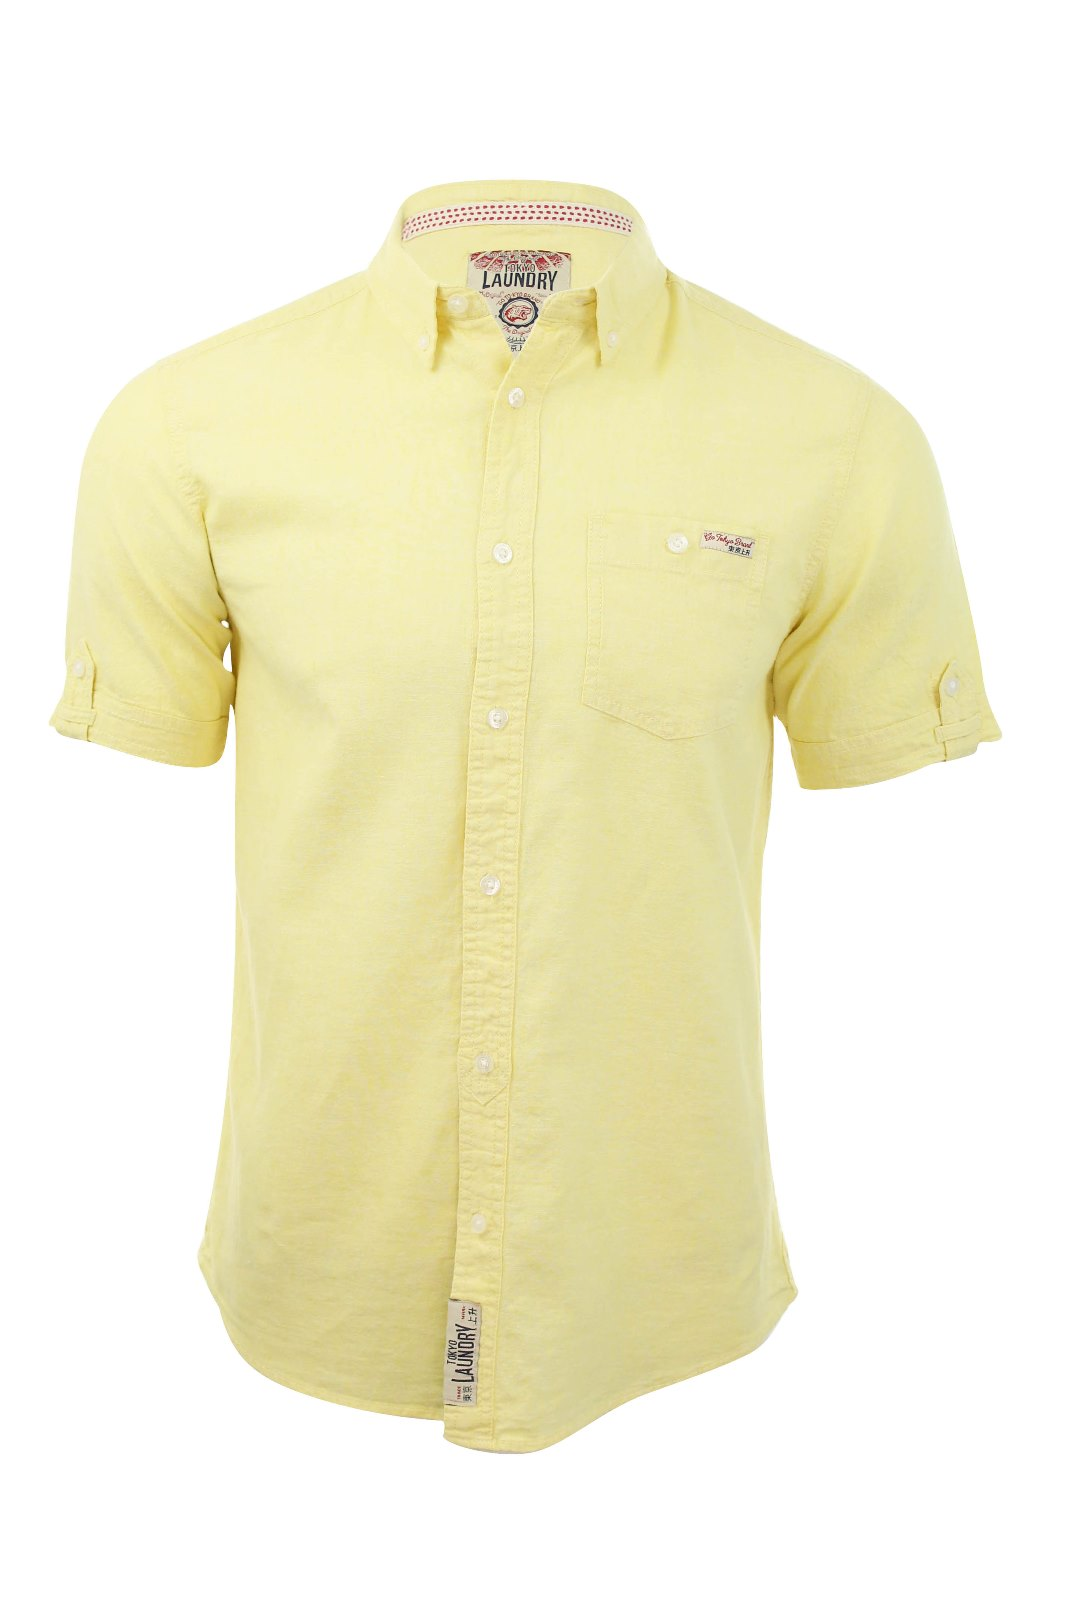 Tokyo laundry mens linen chambray shirt short sleeved ebay for Mens short sleeve linen dress shirts